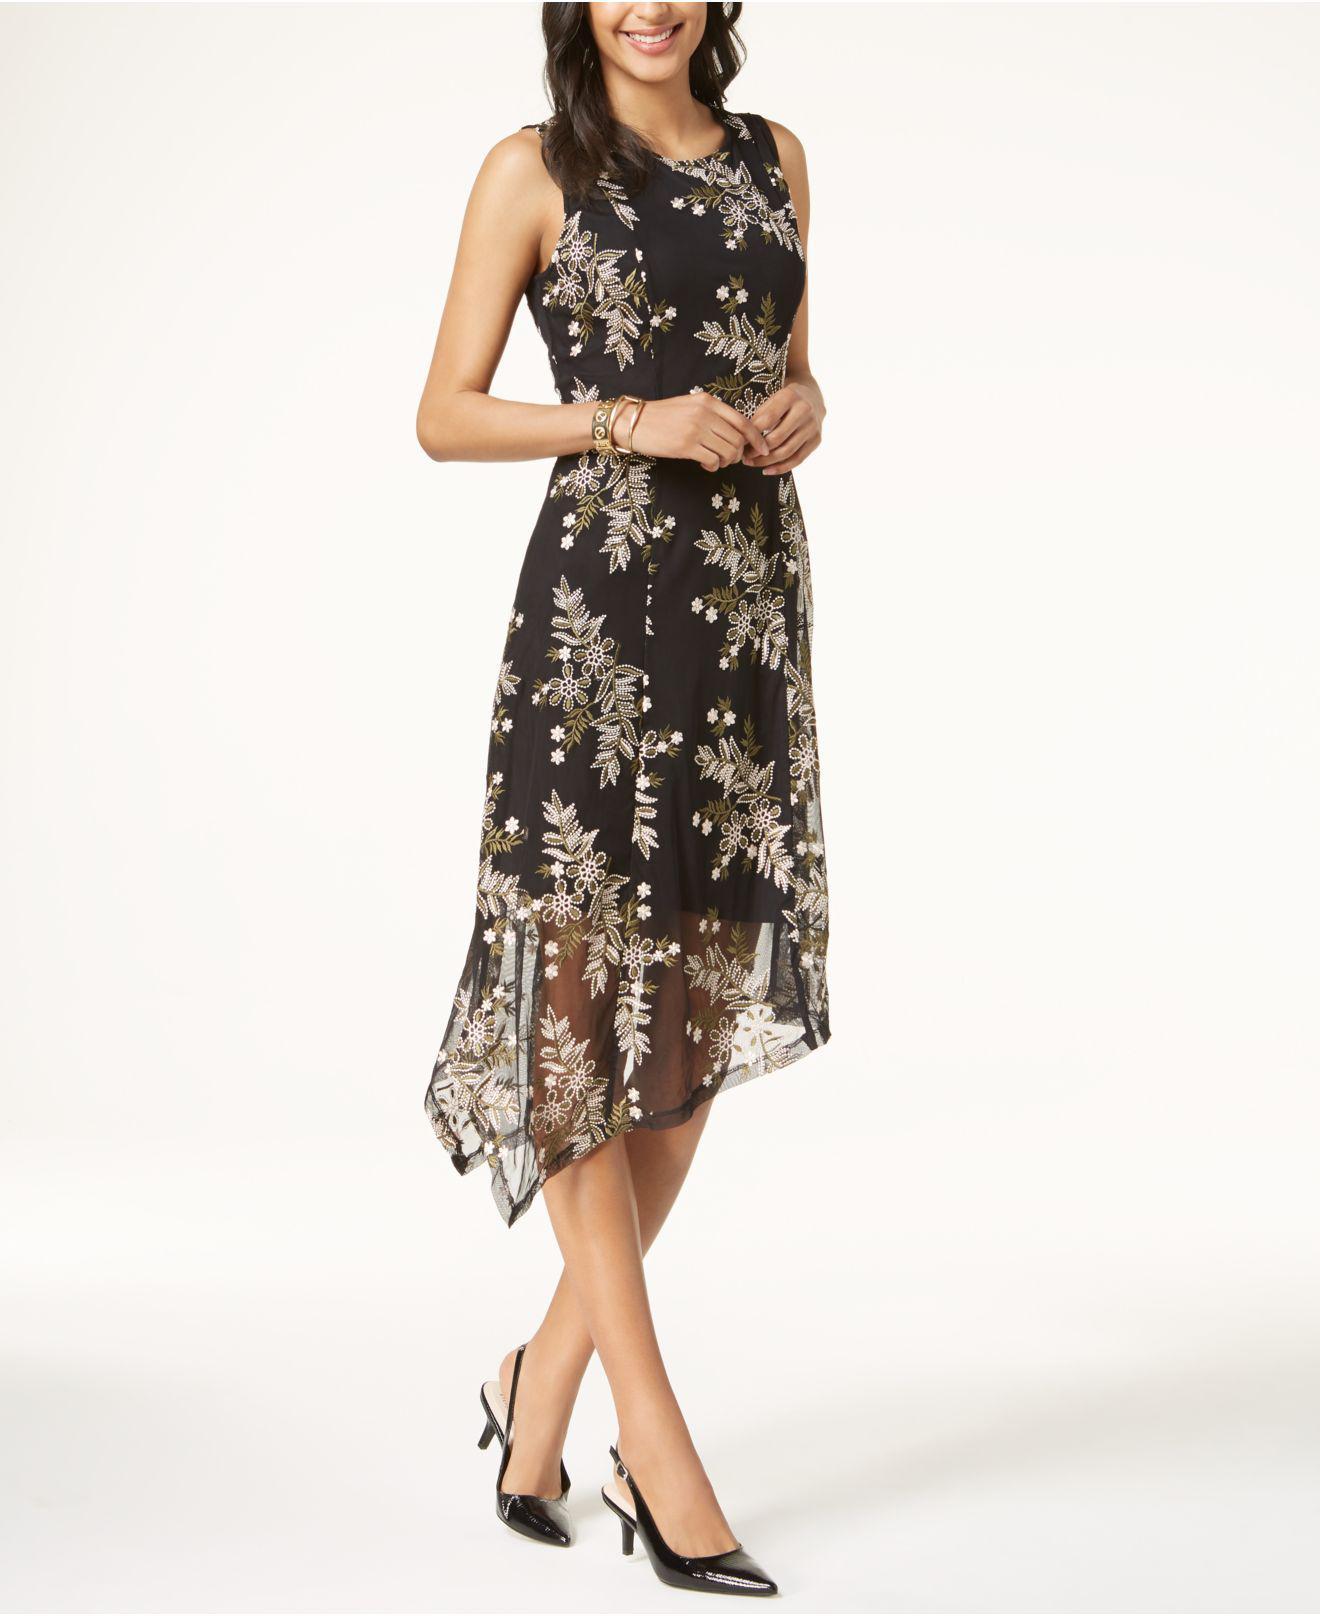 ef0e898d9d5 Lyst - Alfani Embroidered Handkerchief-hem Dress